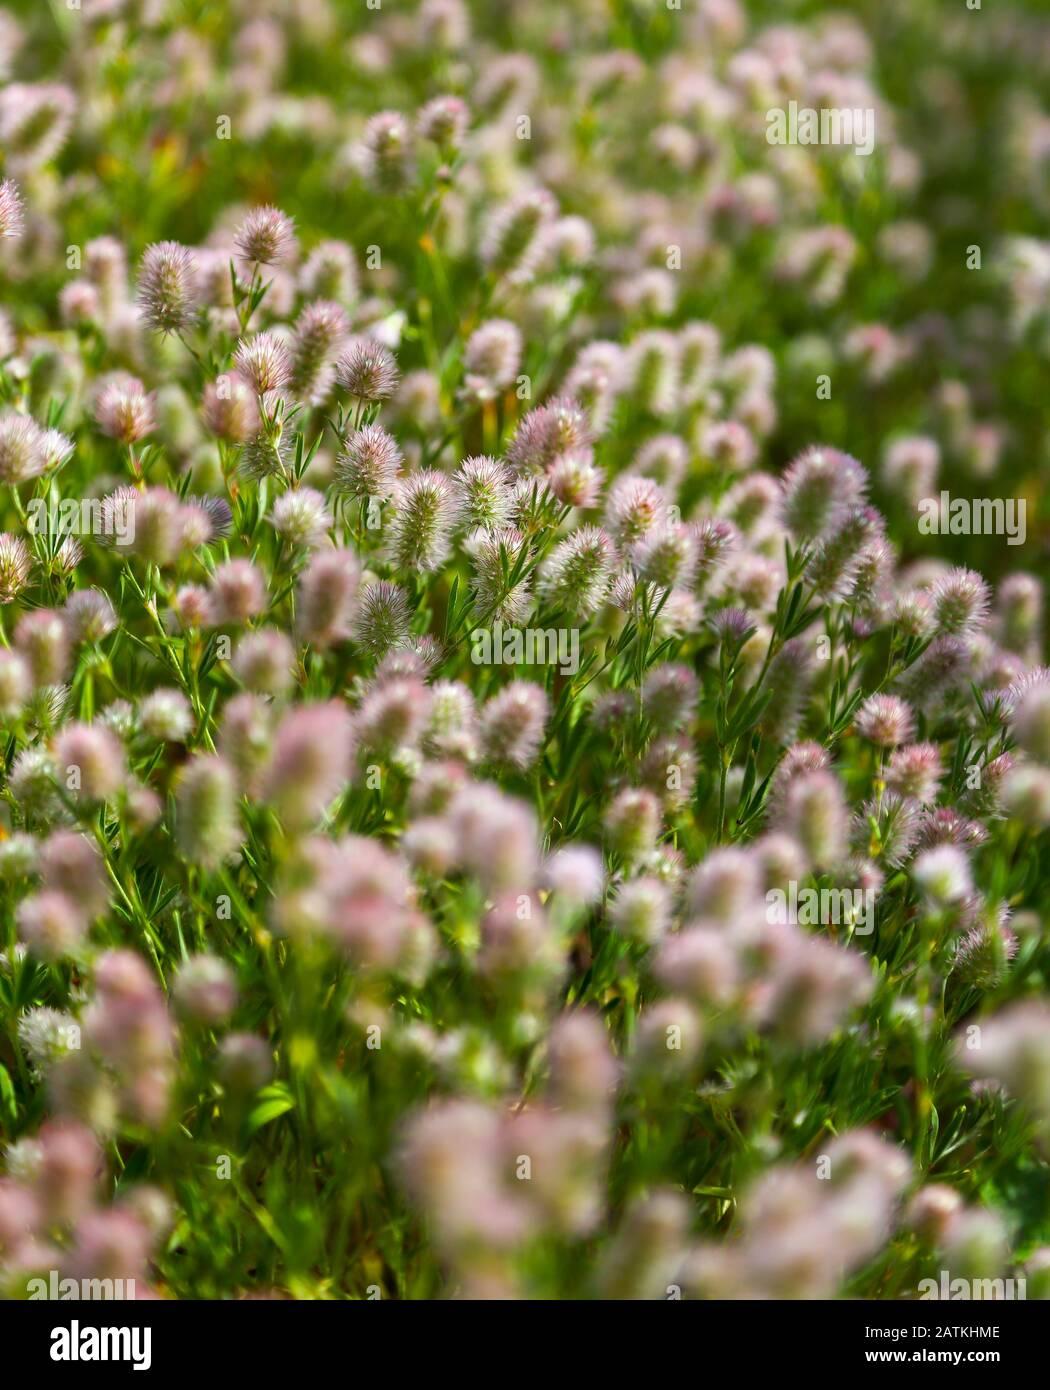 wild-flowers-croatia-2ATKHME.jpg